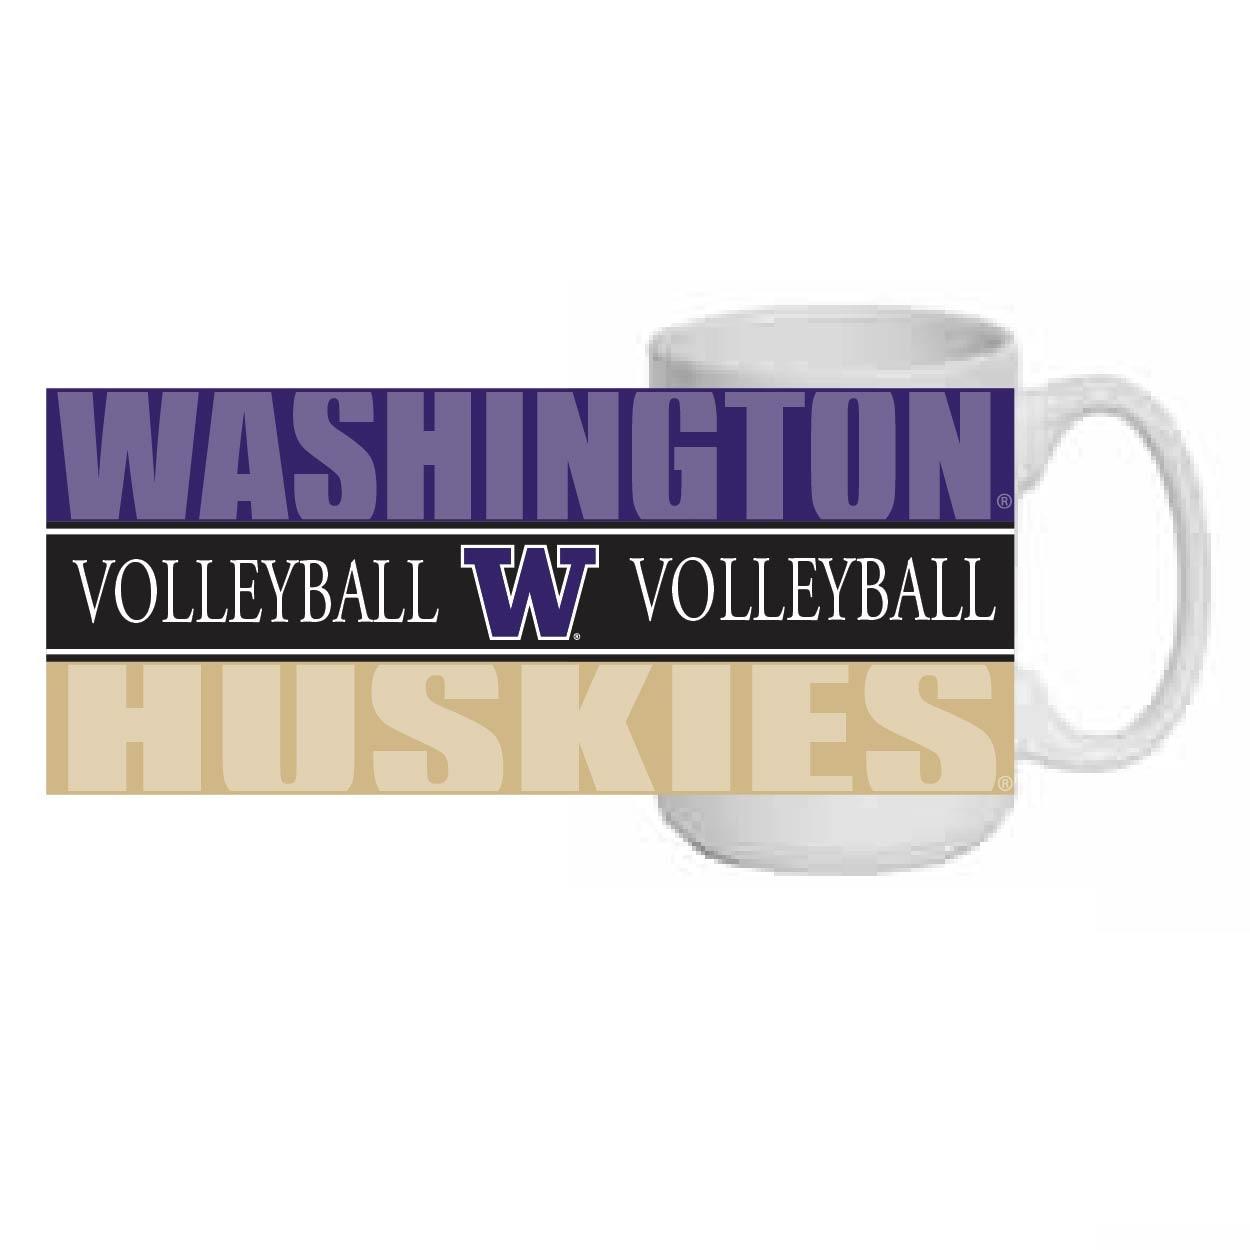 Washington Huskies 15oz Coffee Mug